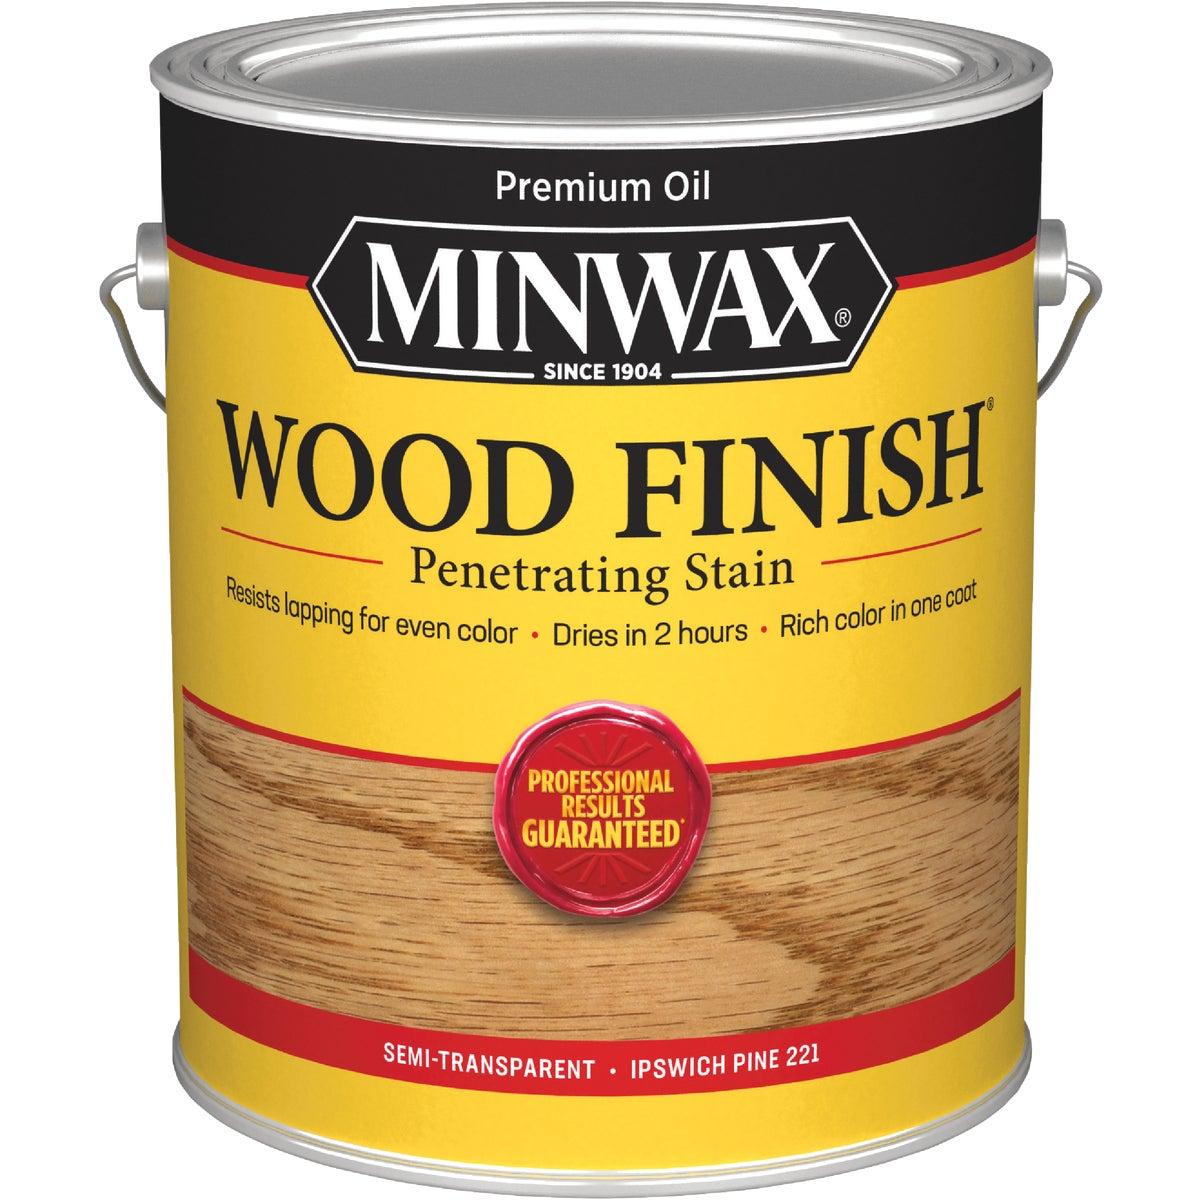 IPSWICH PINE WOOD STAIN - 71004 by Minwax Company